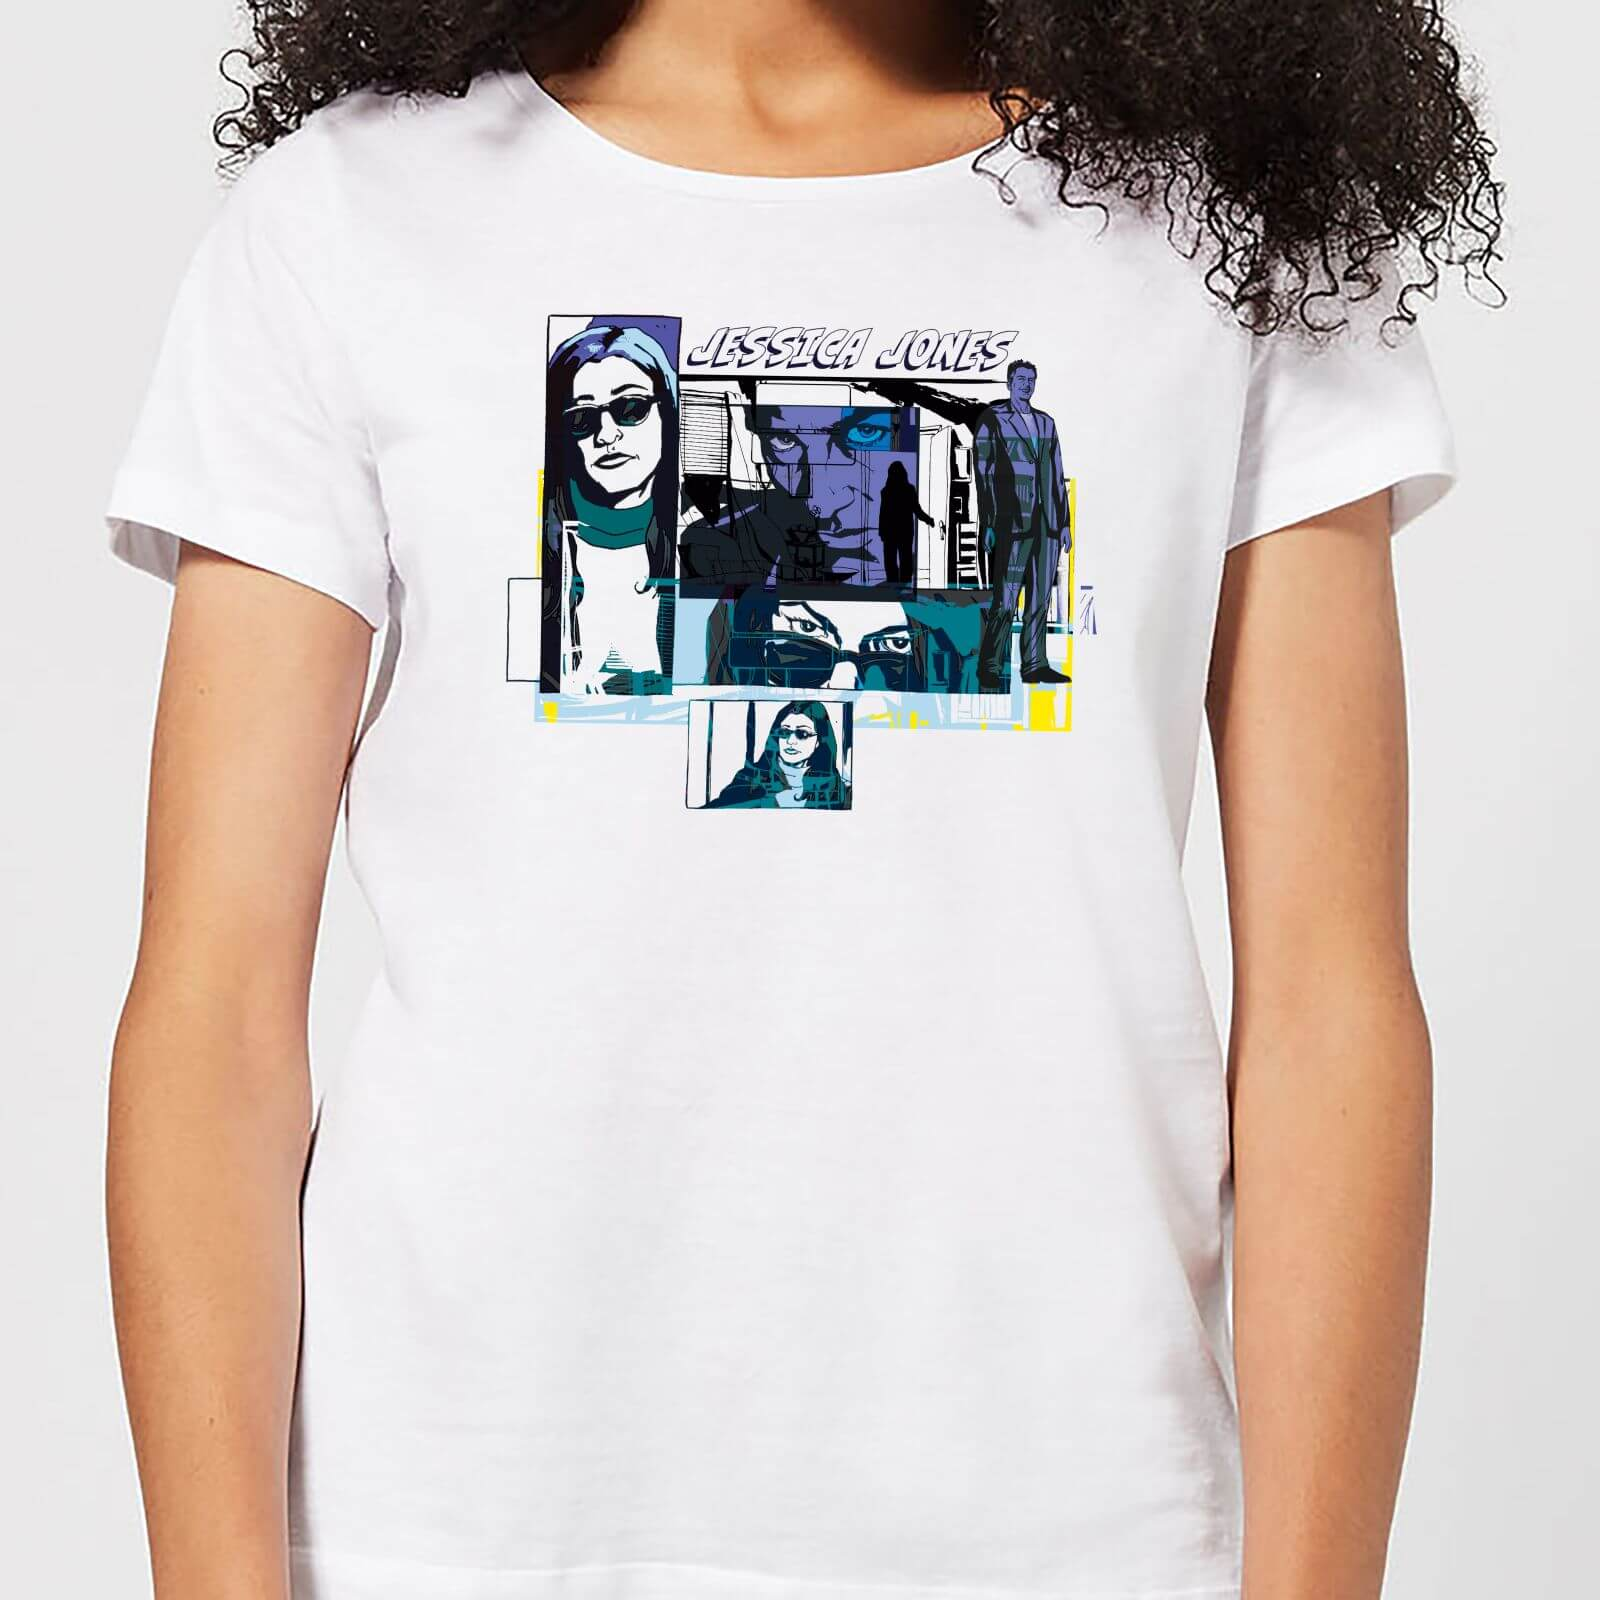 OfferteWeb.click 78-t-shirt-marvel-knights-jessica-jones-comic-panels-bianco